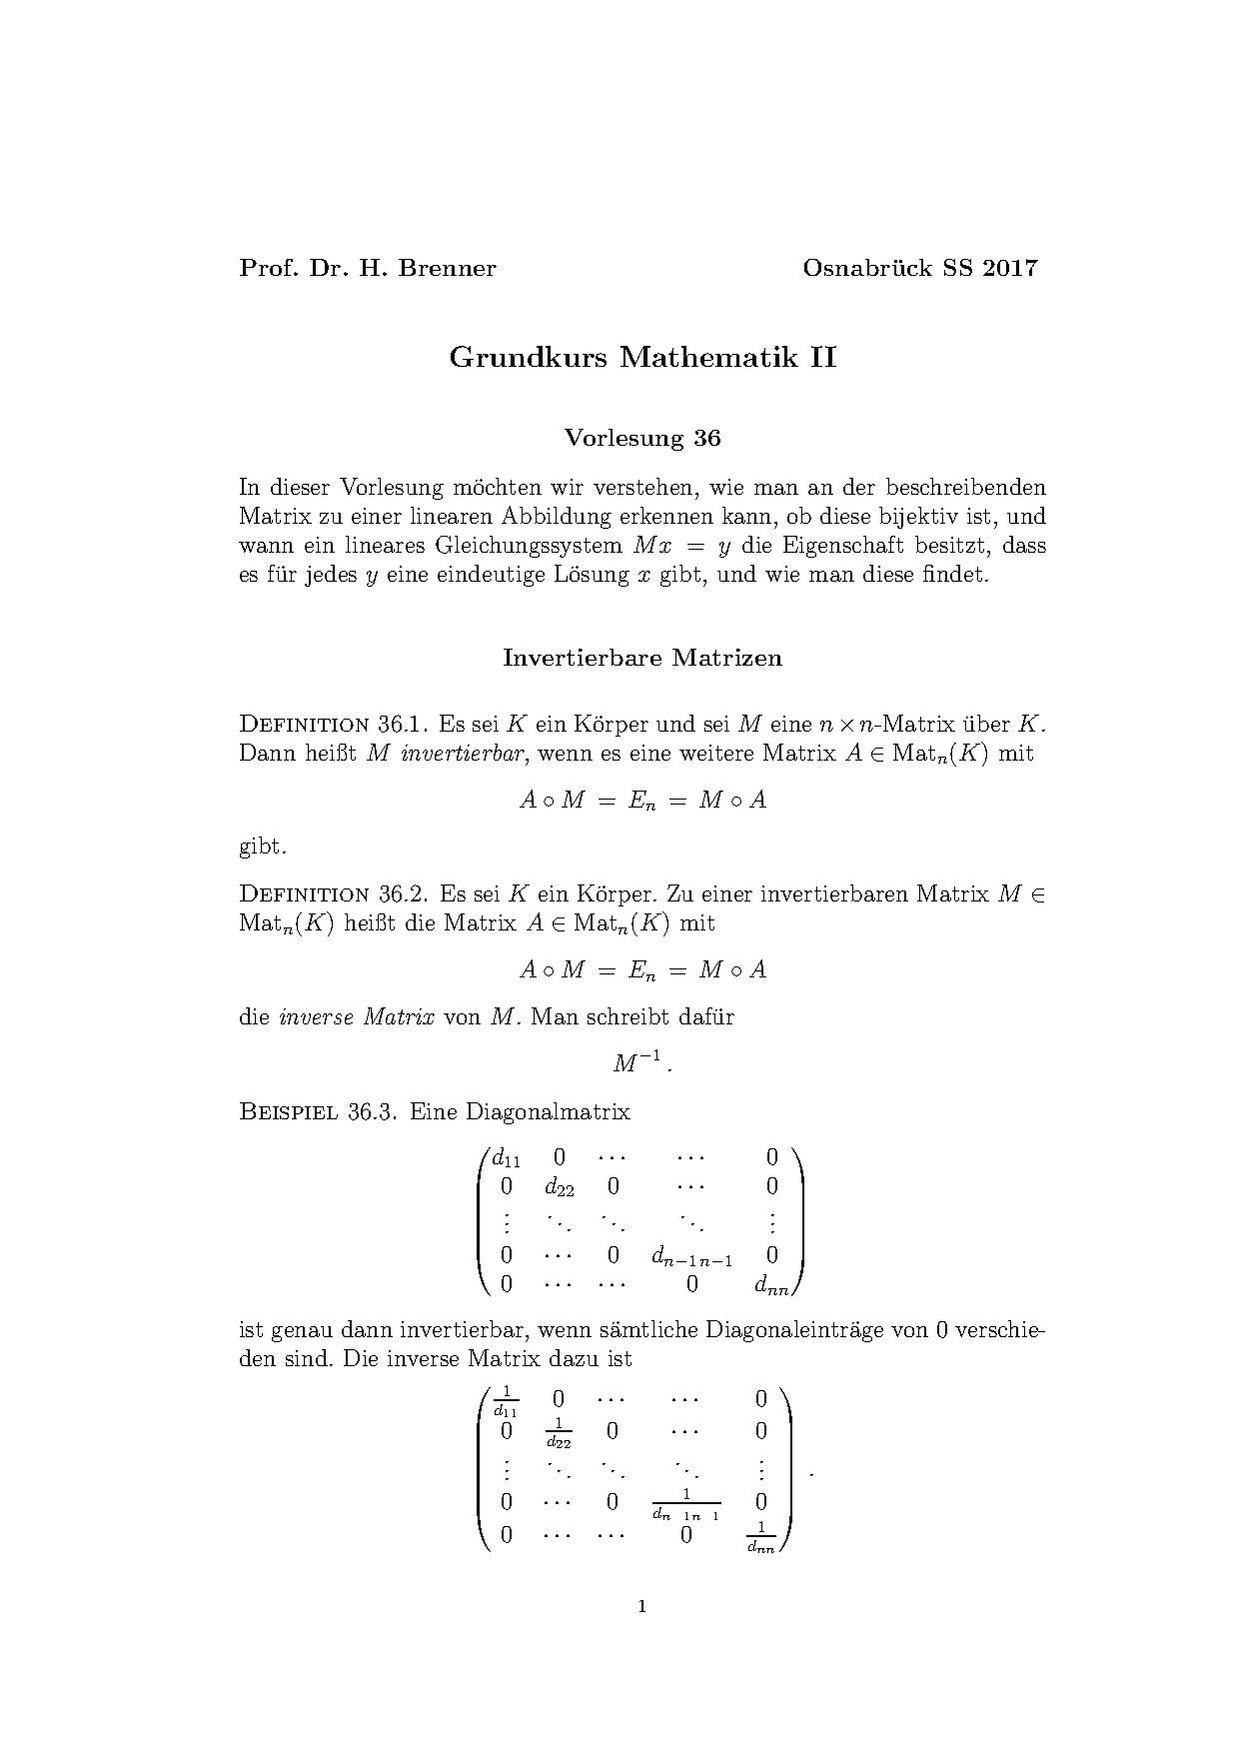 File:Grundkurs Mathematik (Osnabrück 2016-2017)Teil IIVorlesung36 ...